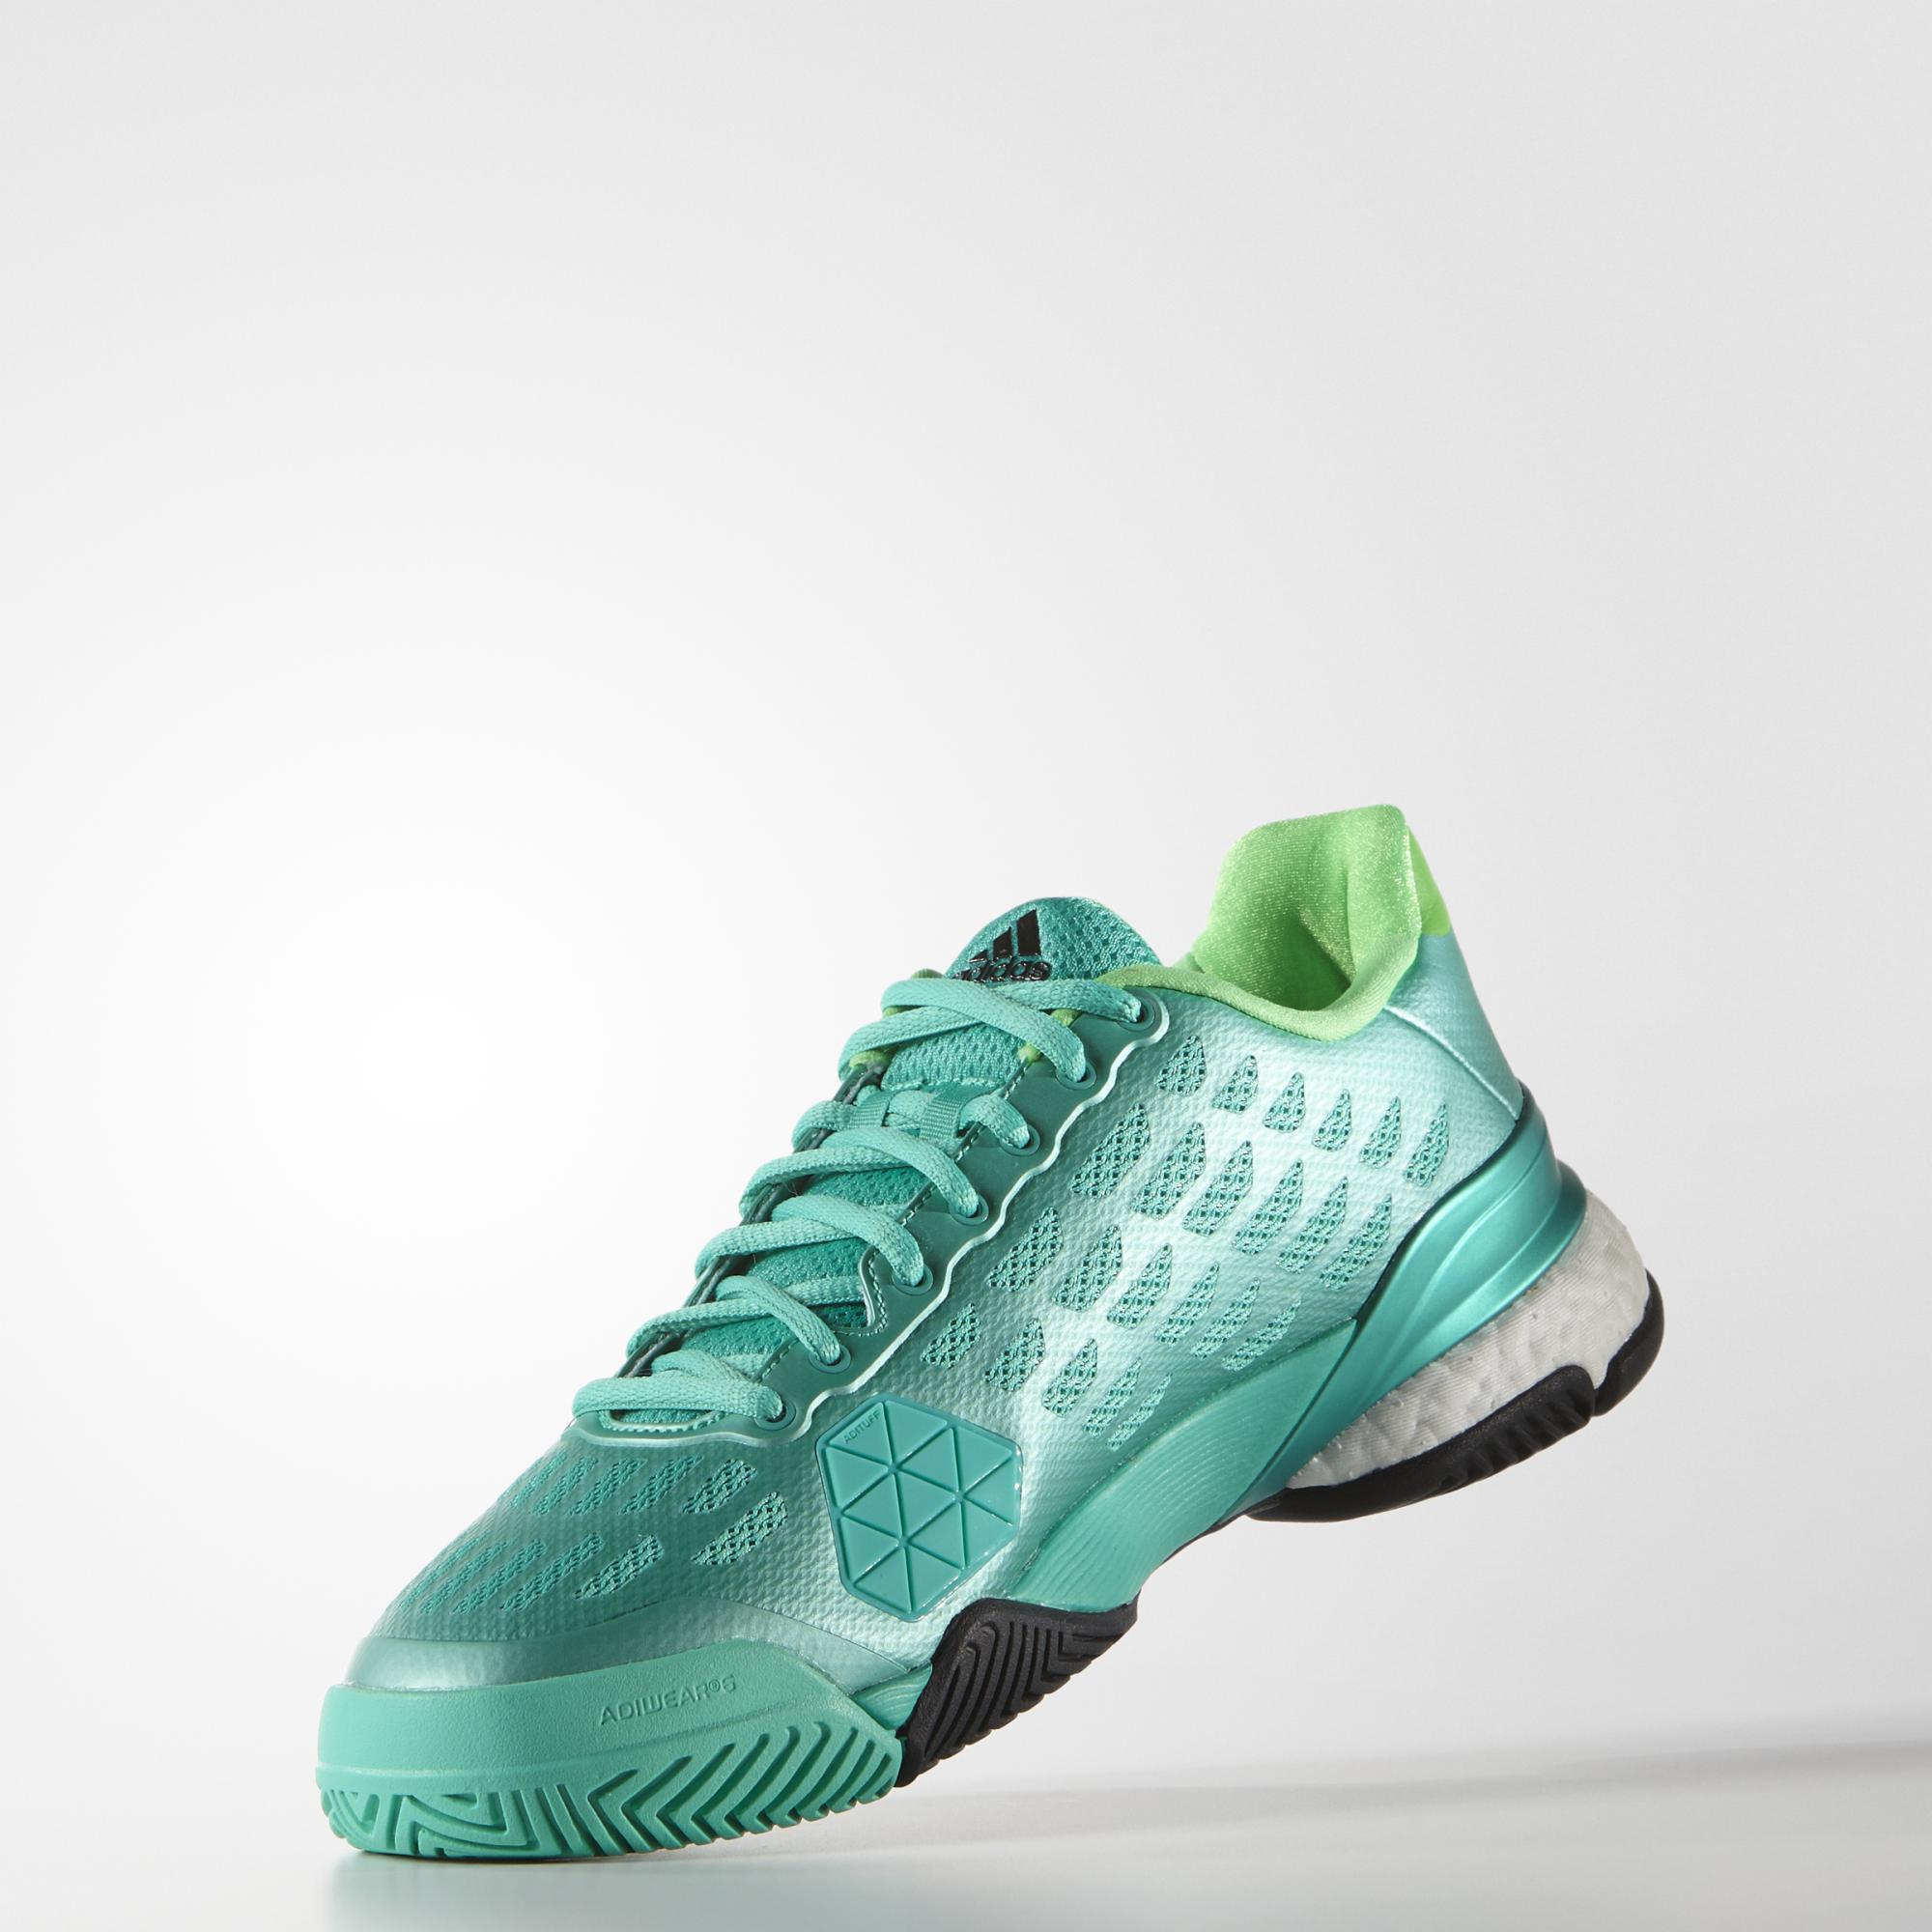 adidas barricade shoes boost